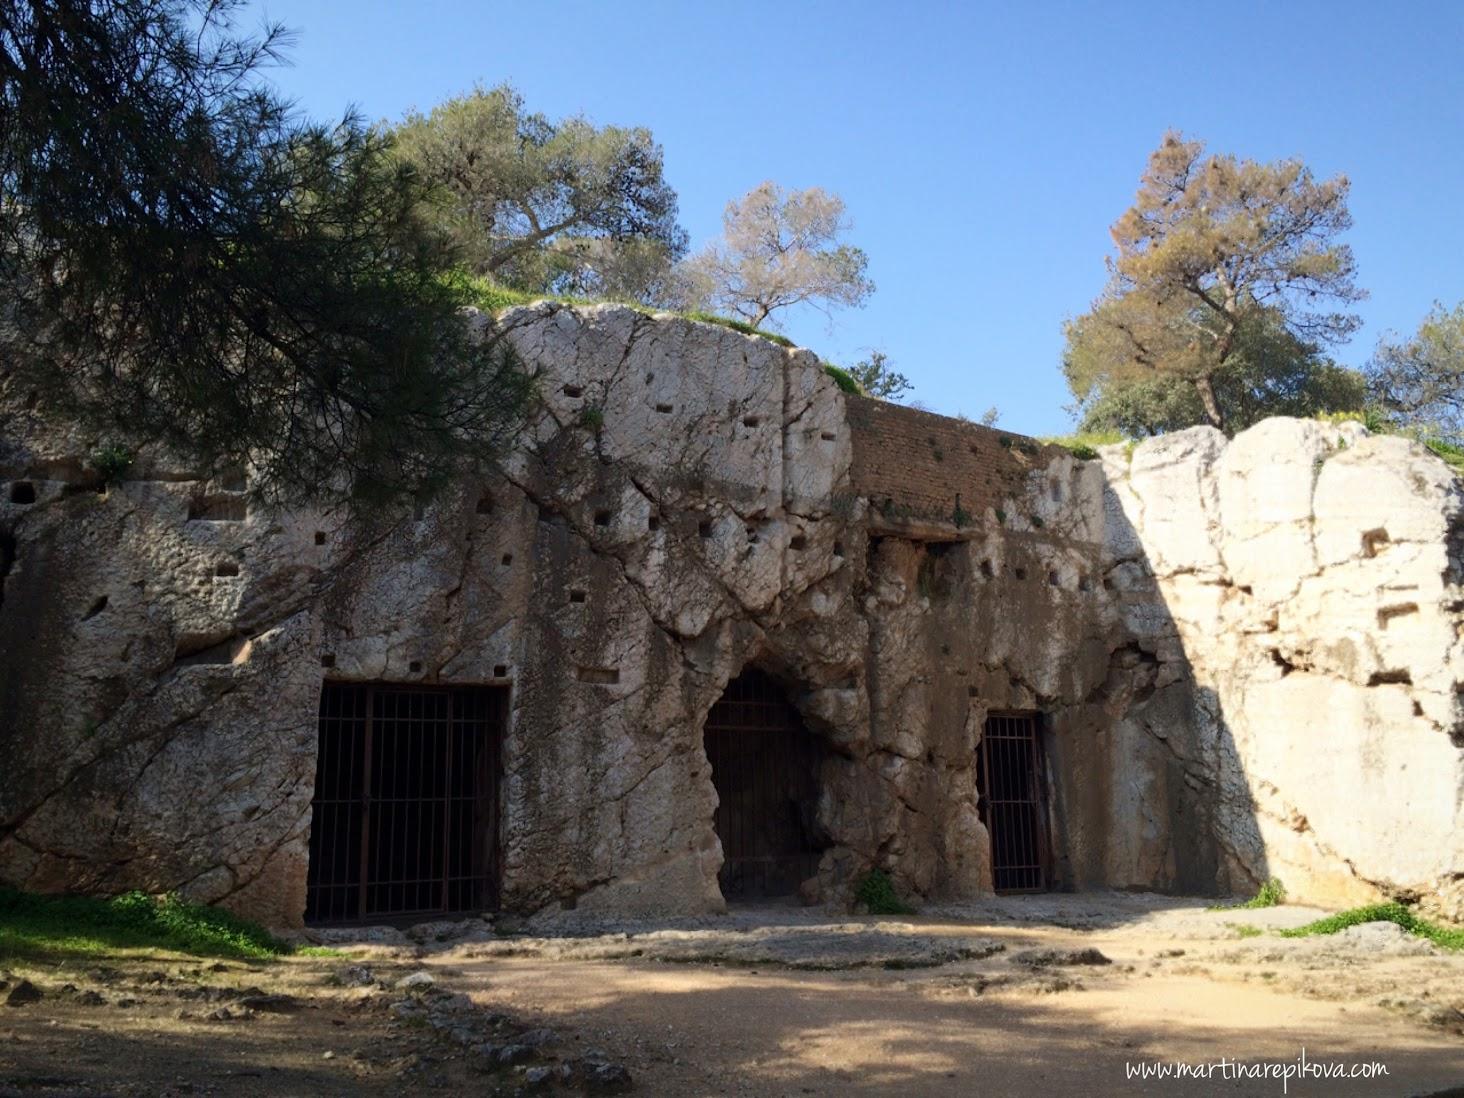 Socrates' prison, Athens, Greece